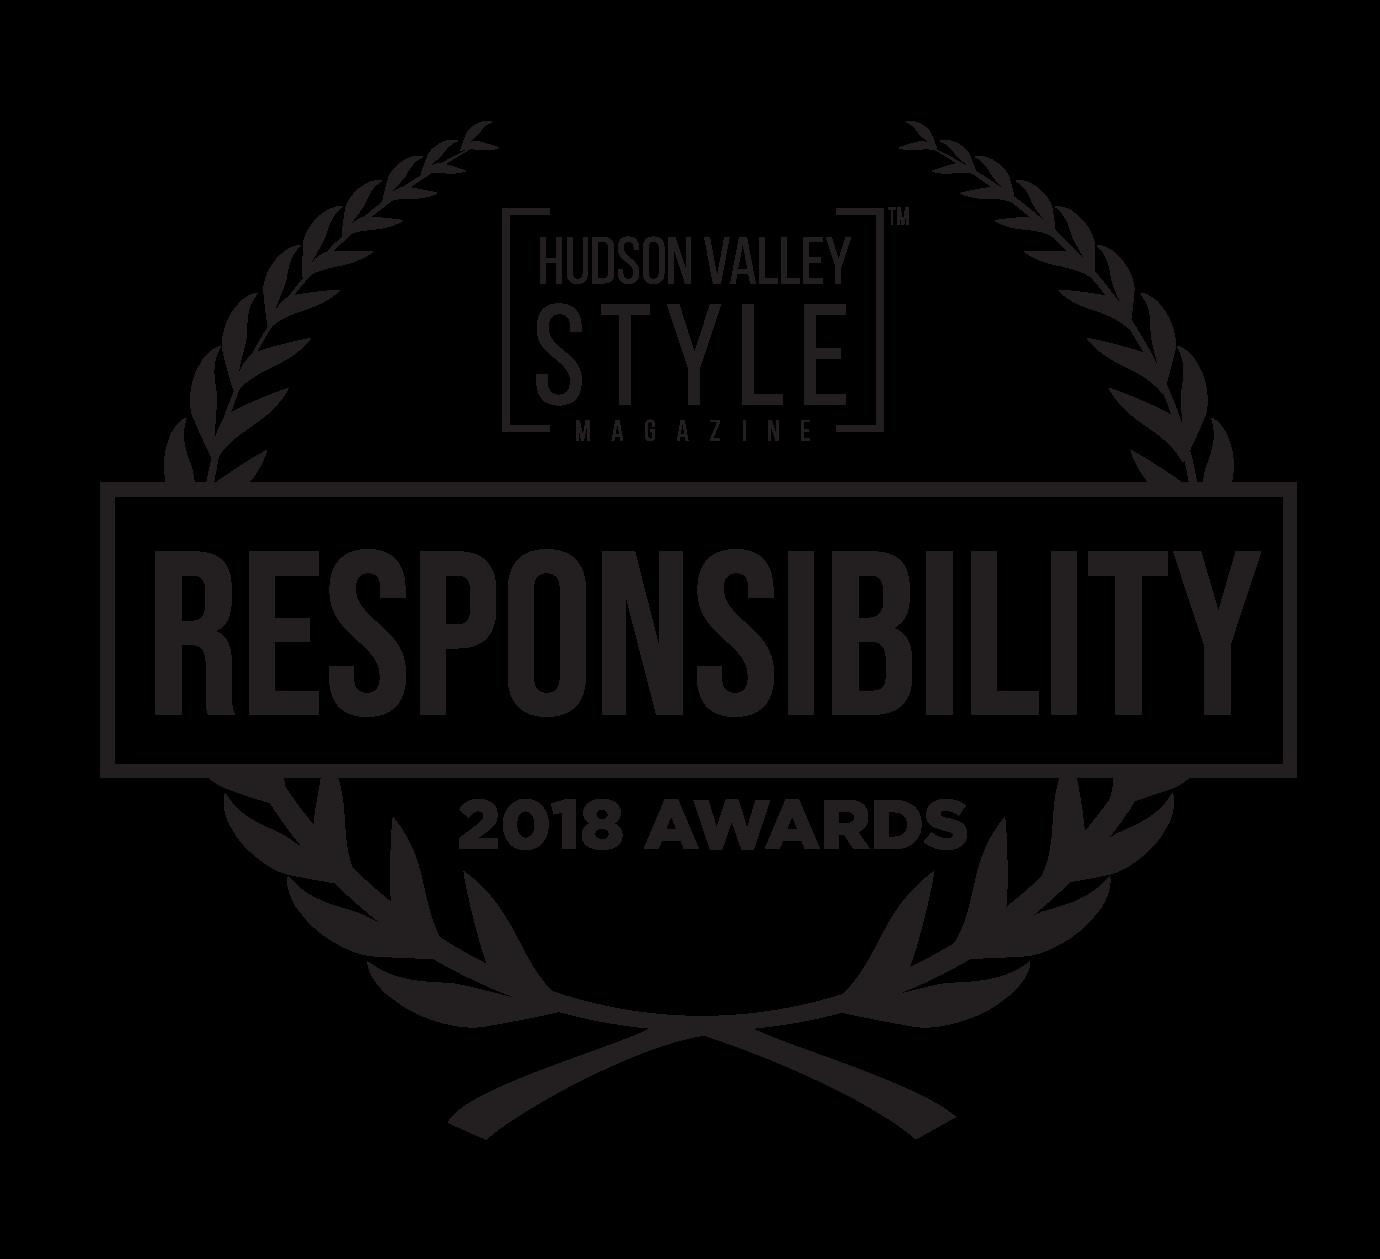 Hudson Valley Style Magazine Awards: Social Responsibility